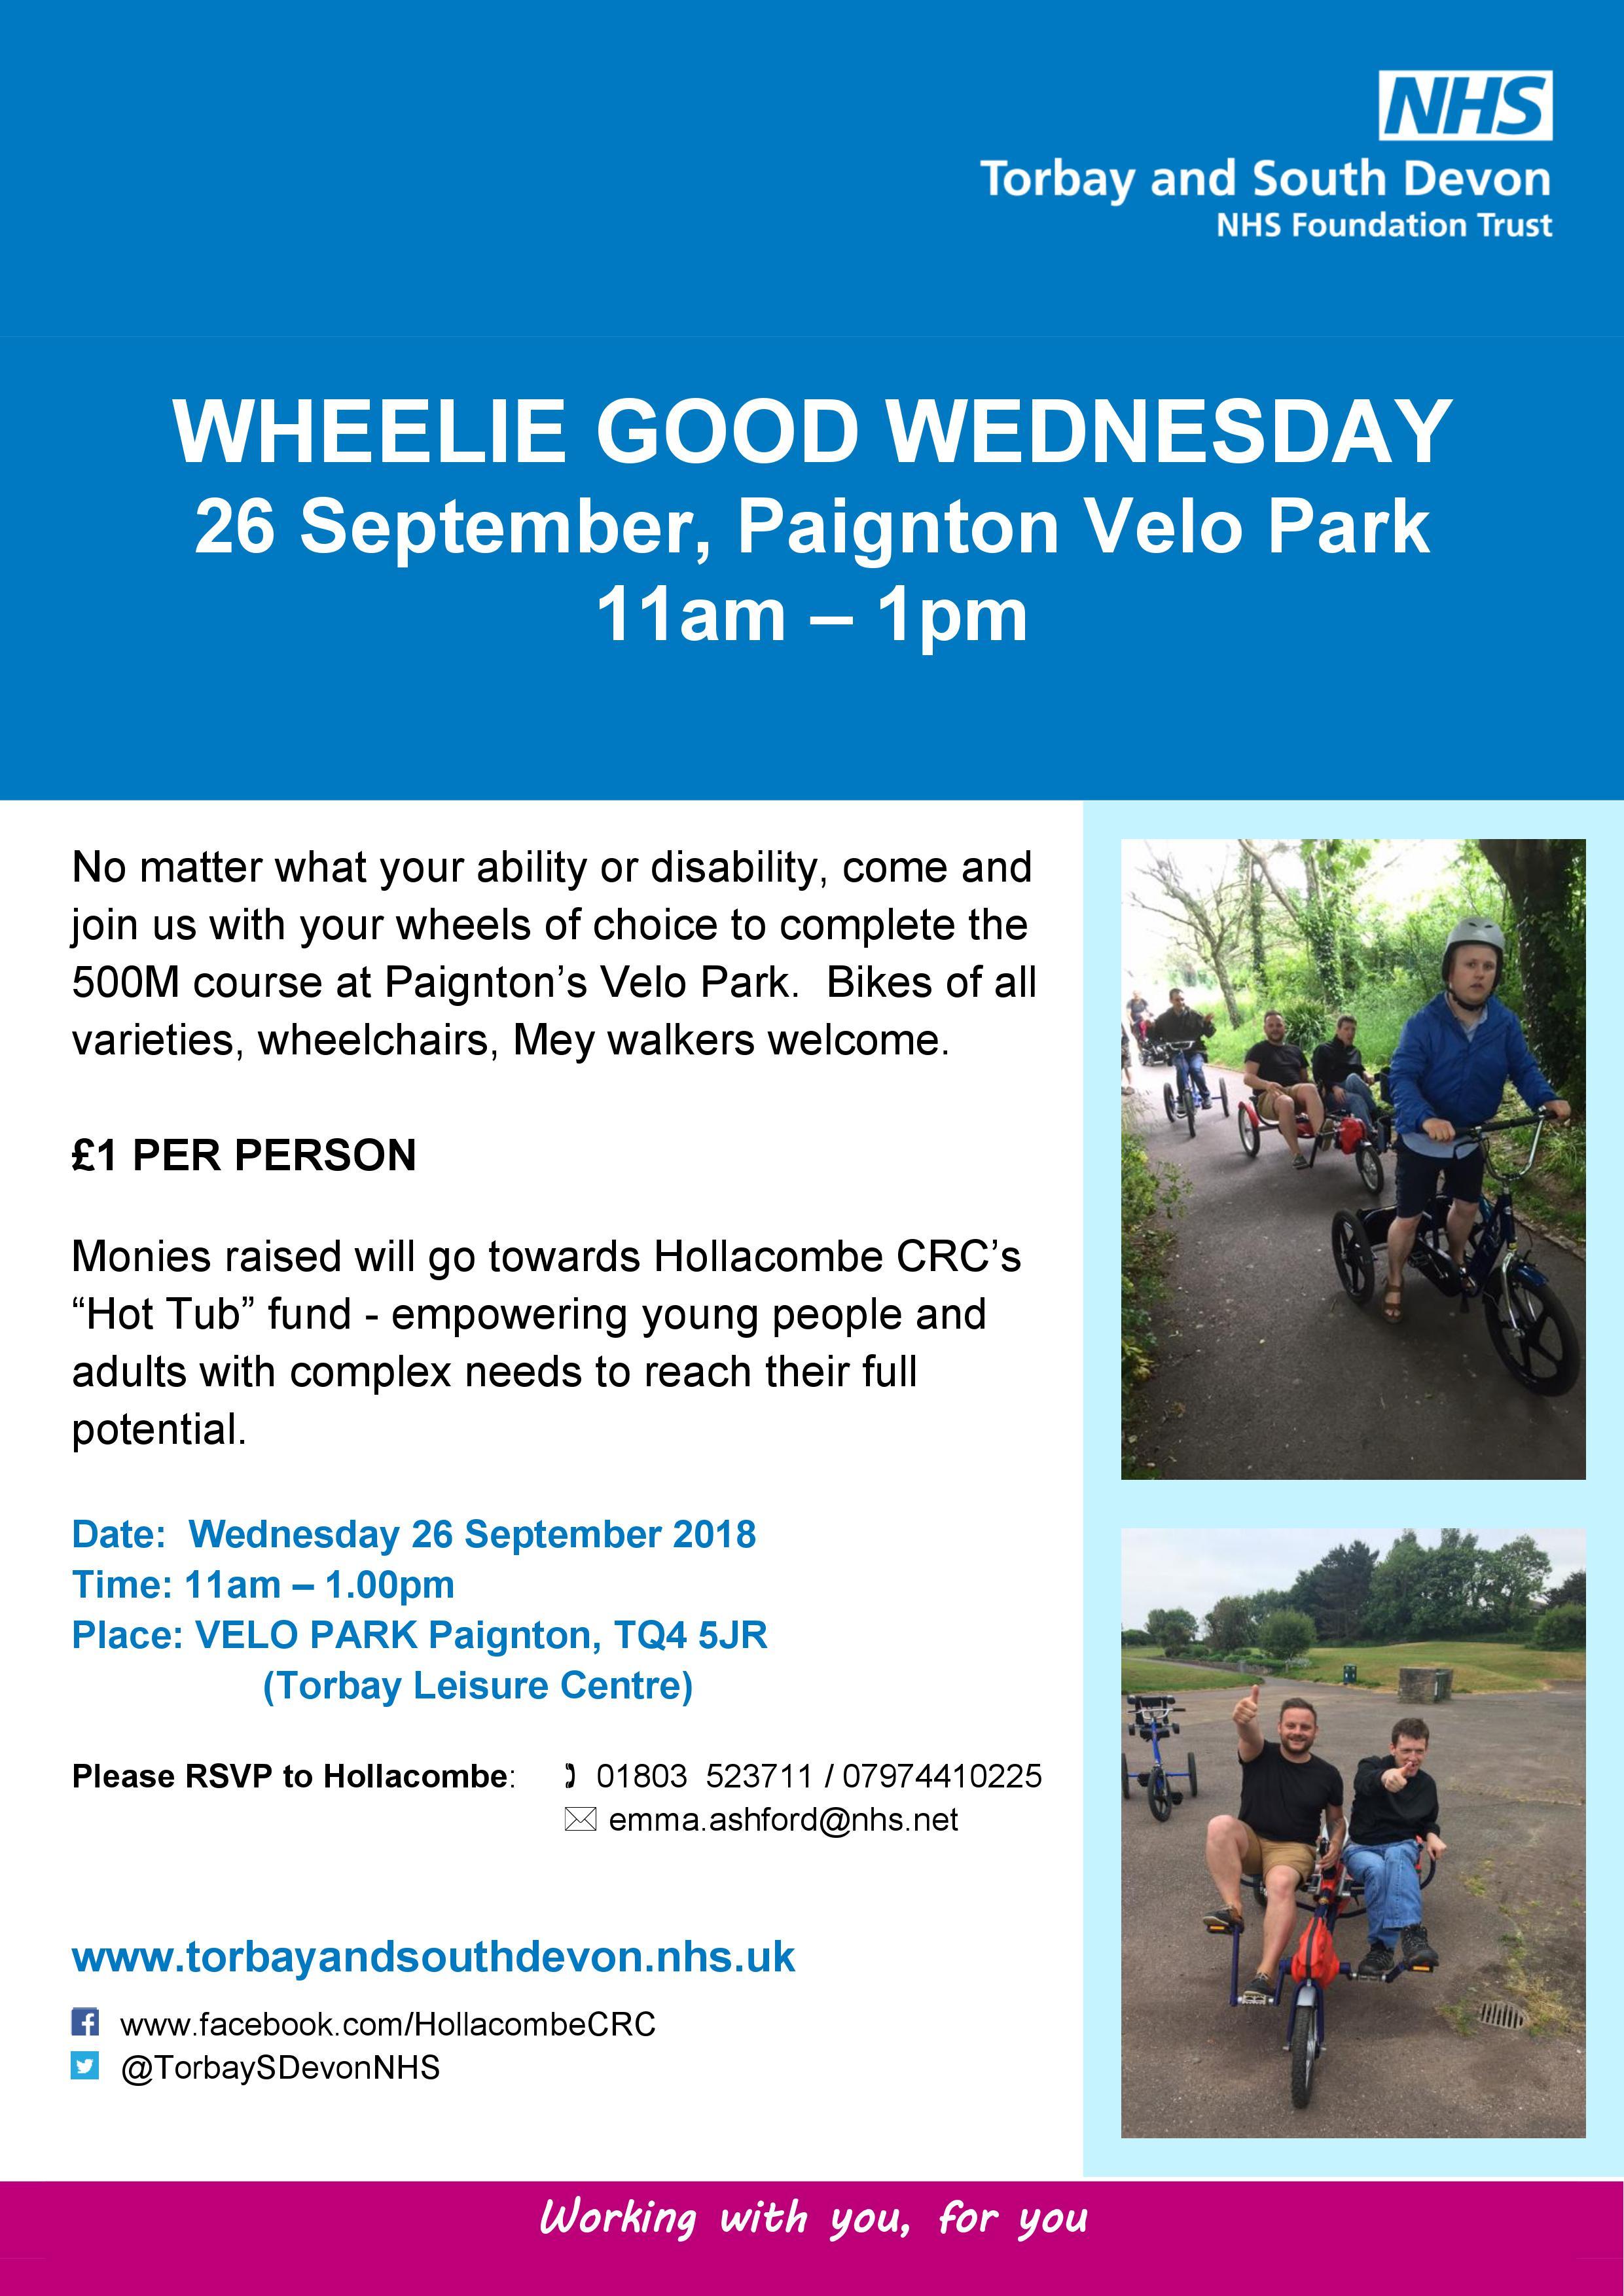 Wheelie Good Wednesday